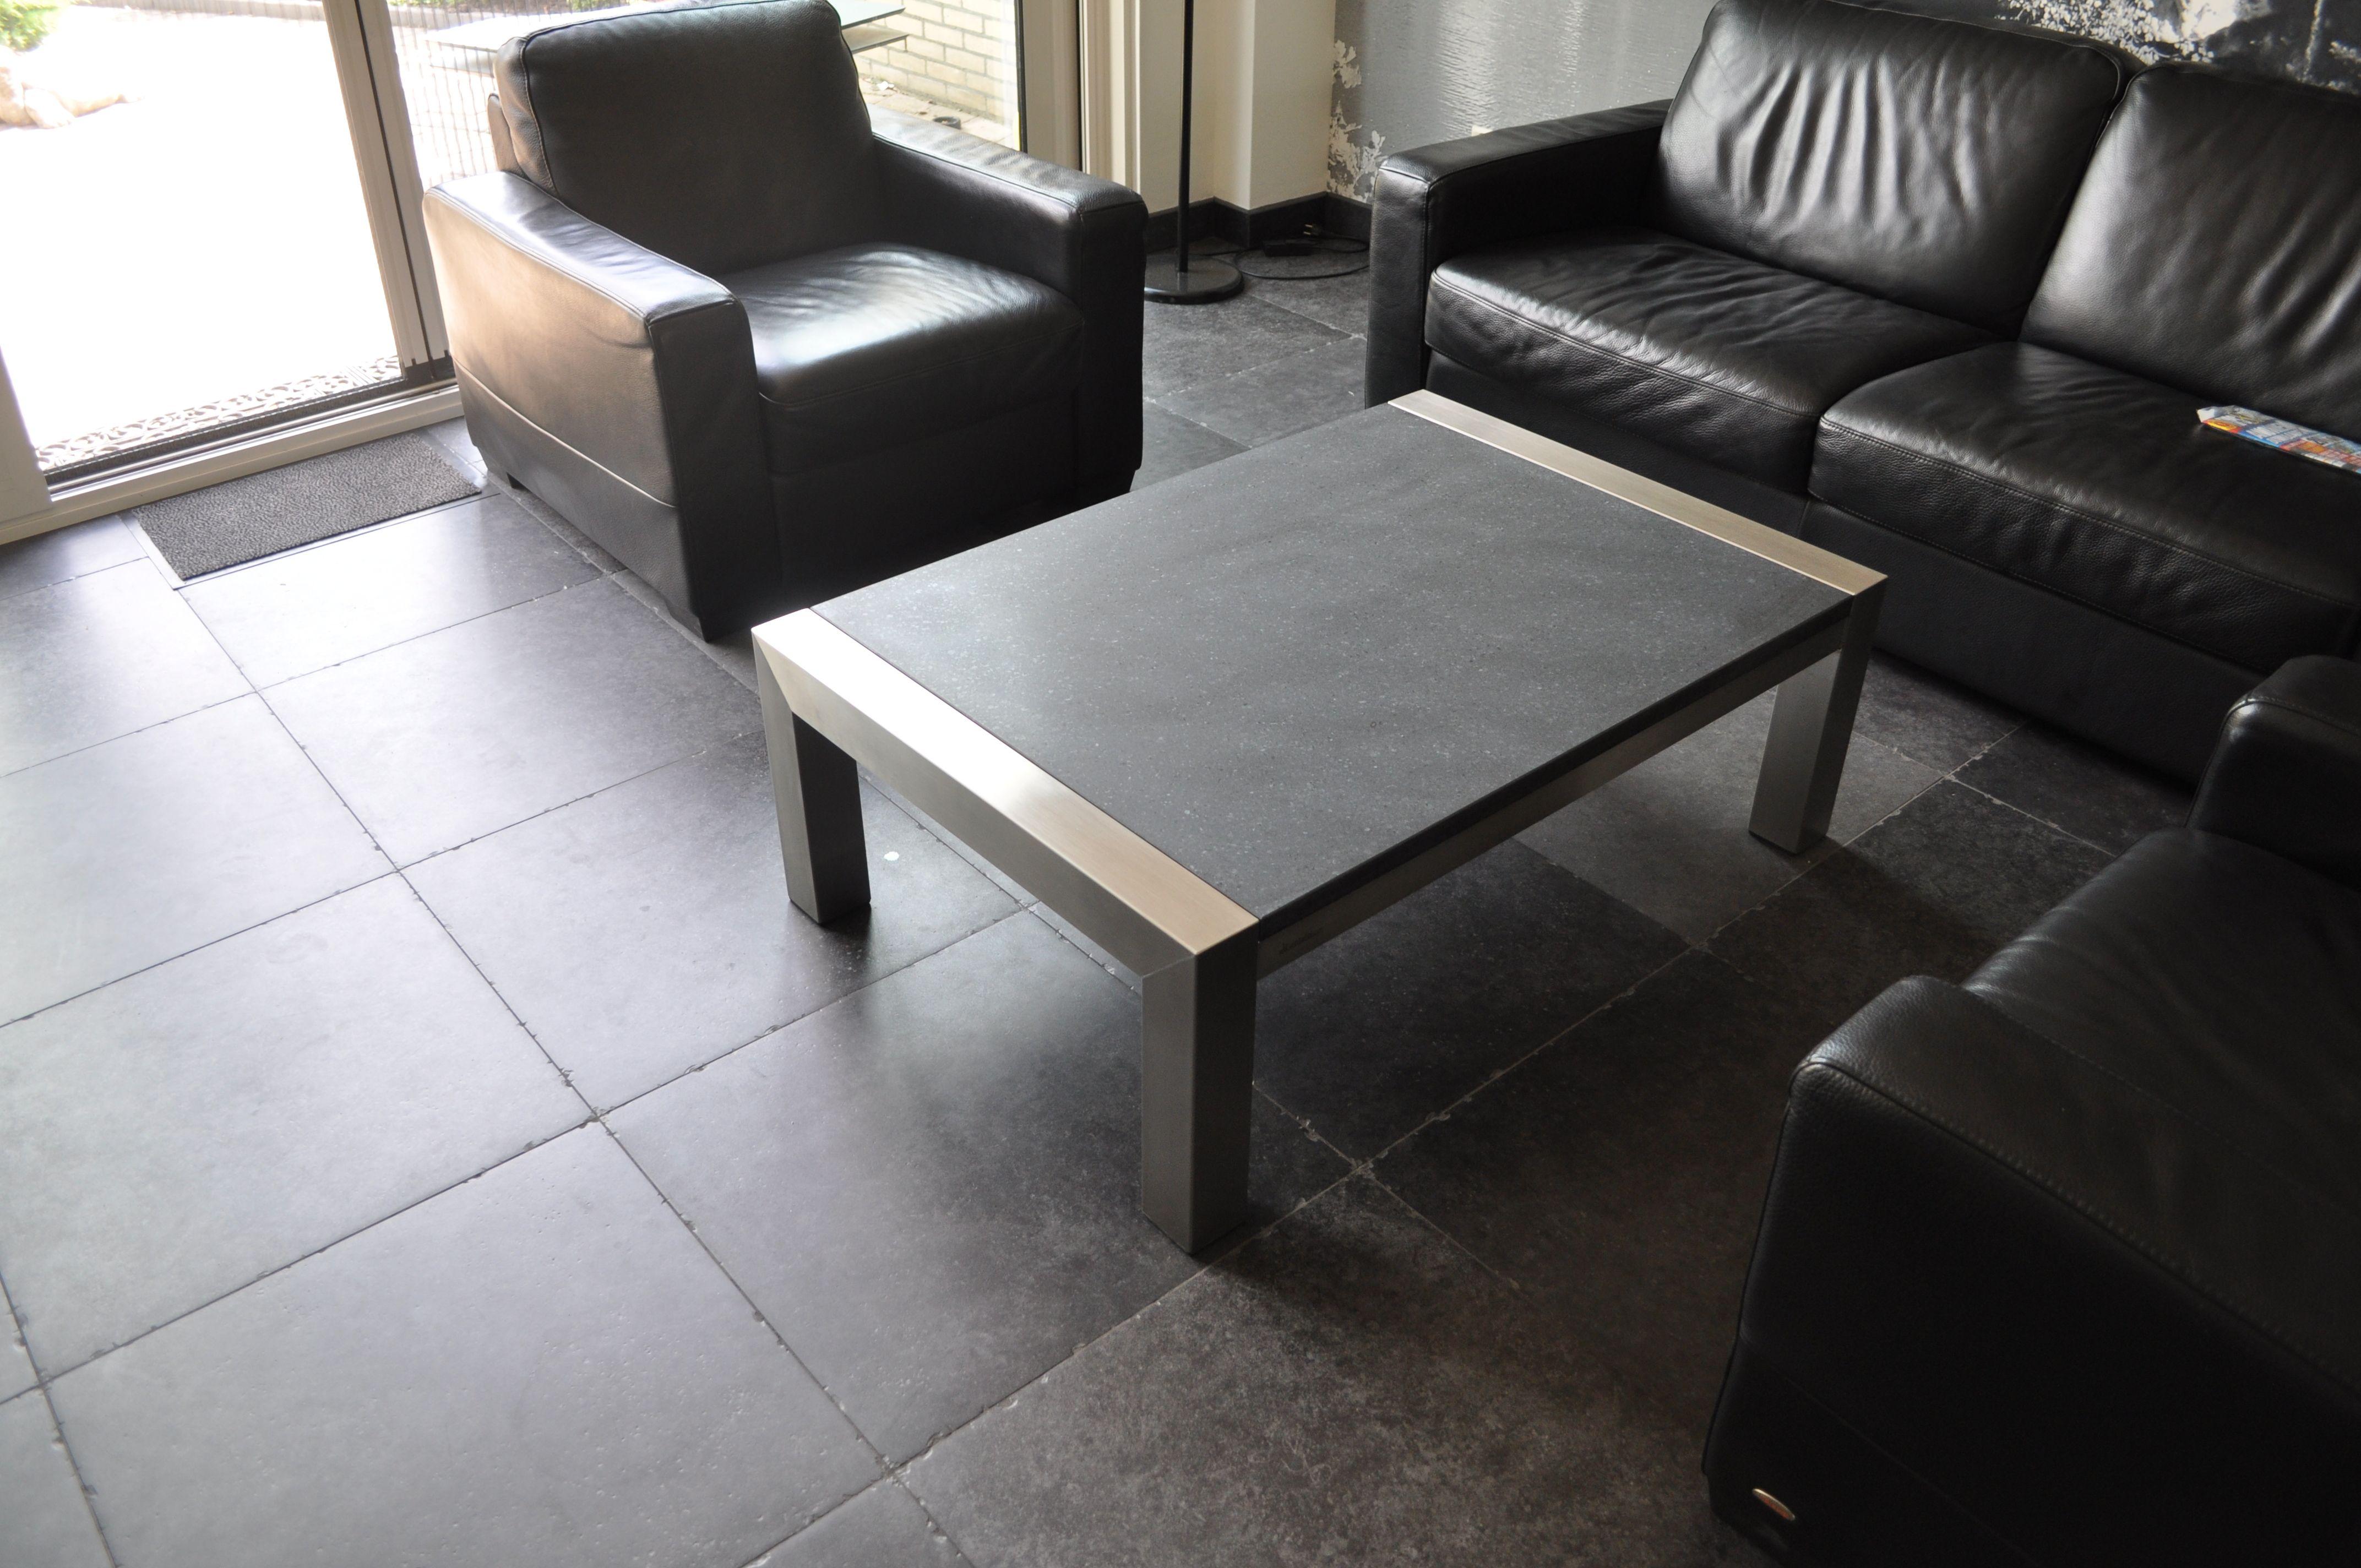 Moderne #salontafel met #rvs en natuursteen. #tafel #modern